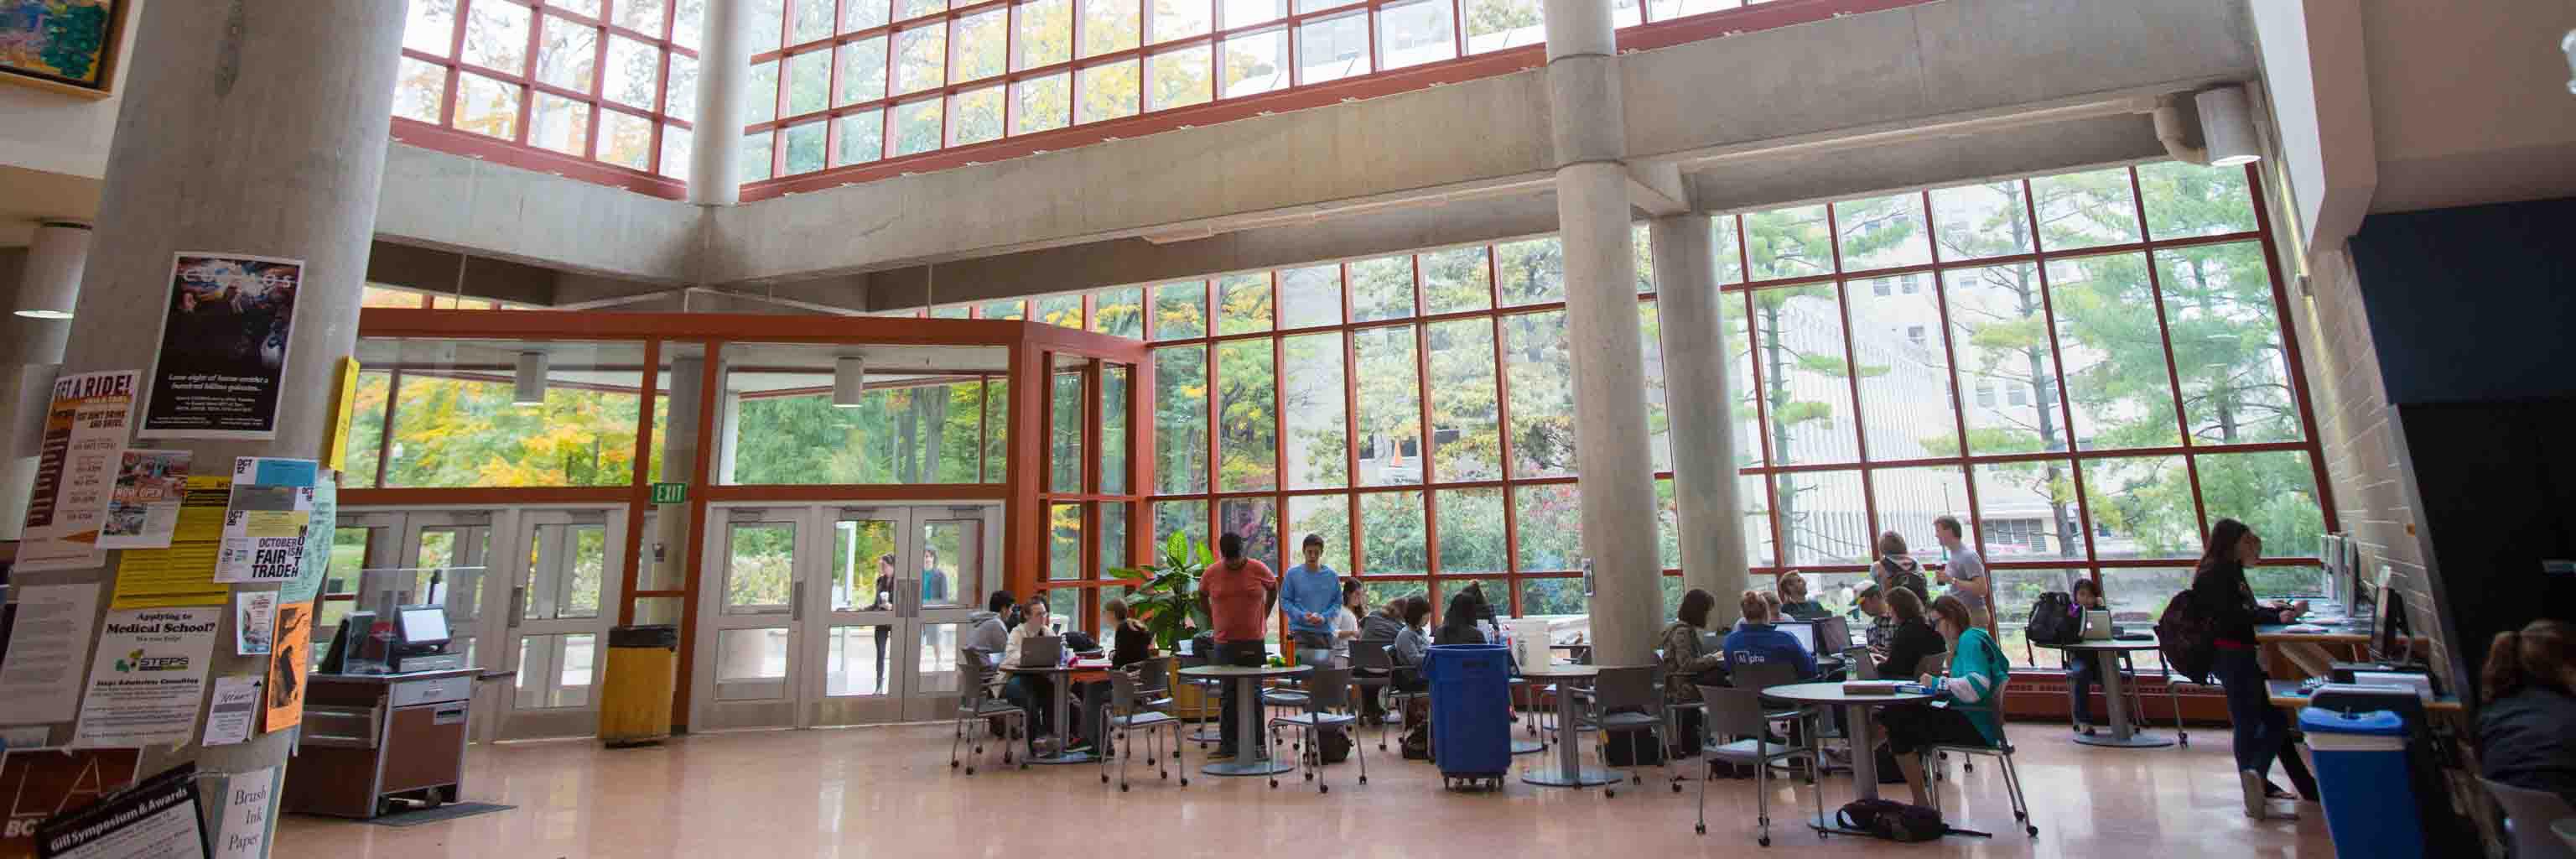 Contact Center For Genomics And Bioinformatics Indiana University Bloomington